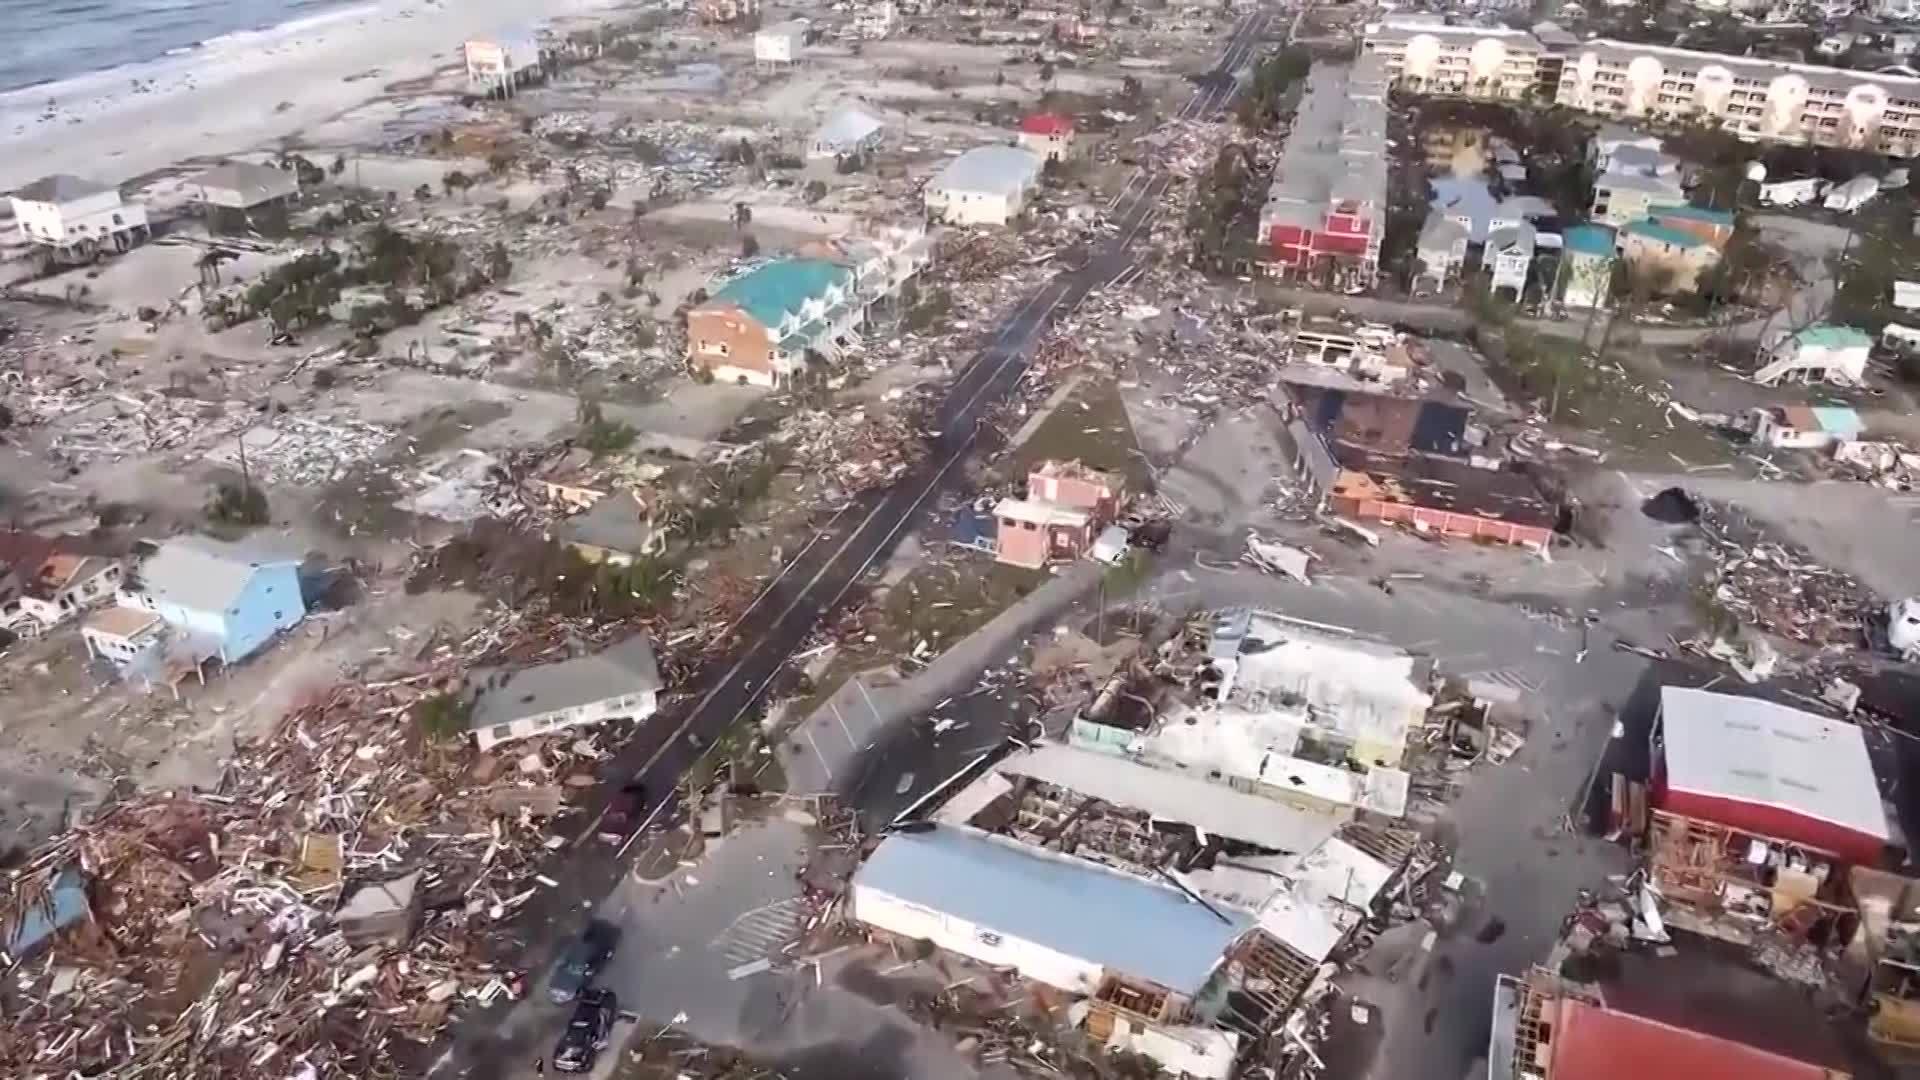 Michael_beach_damage_aerials_0_20181012173018-54787066